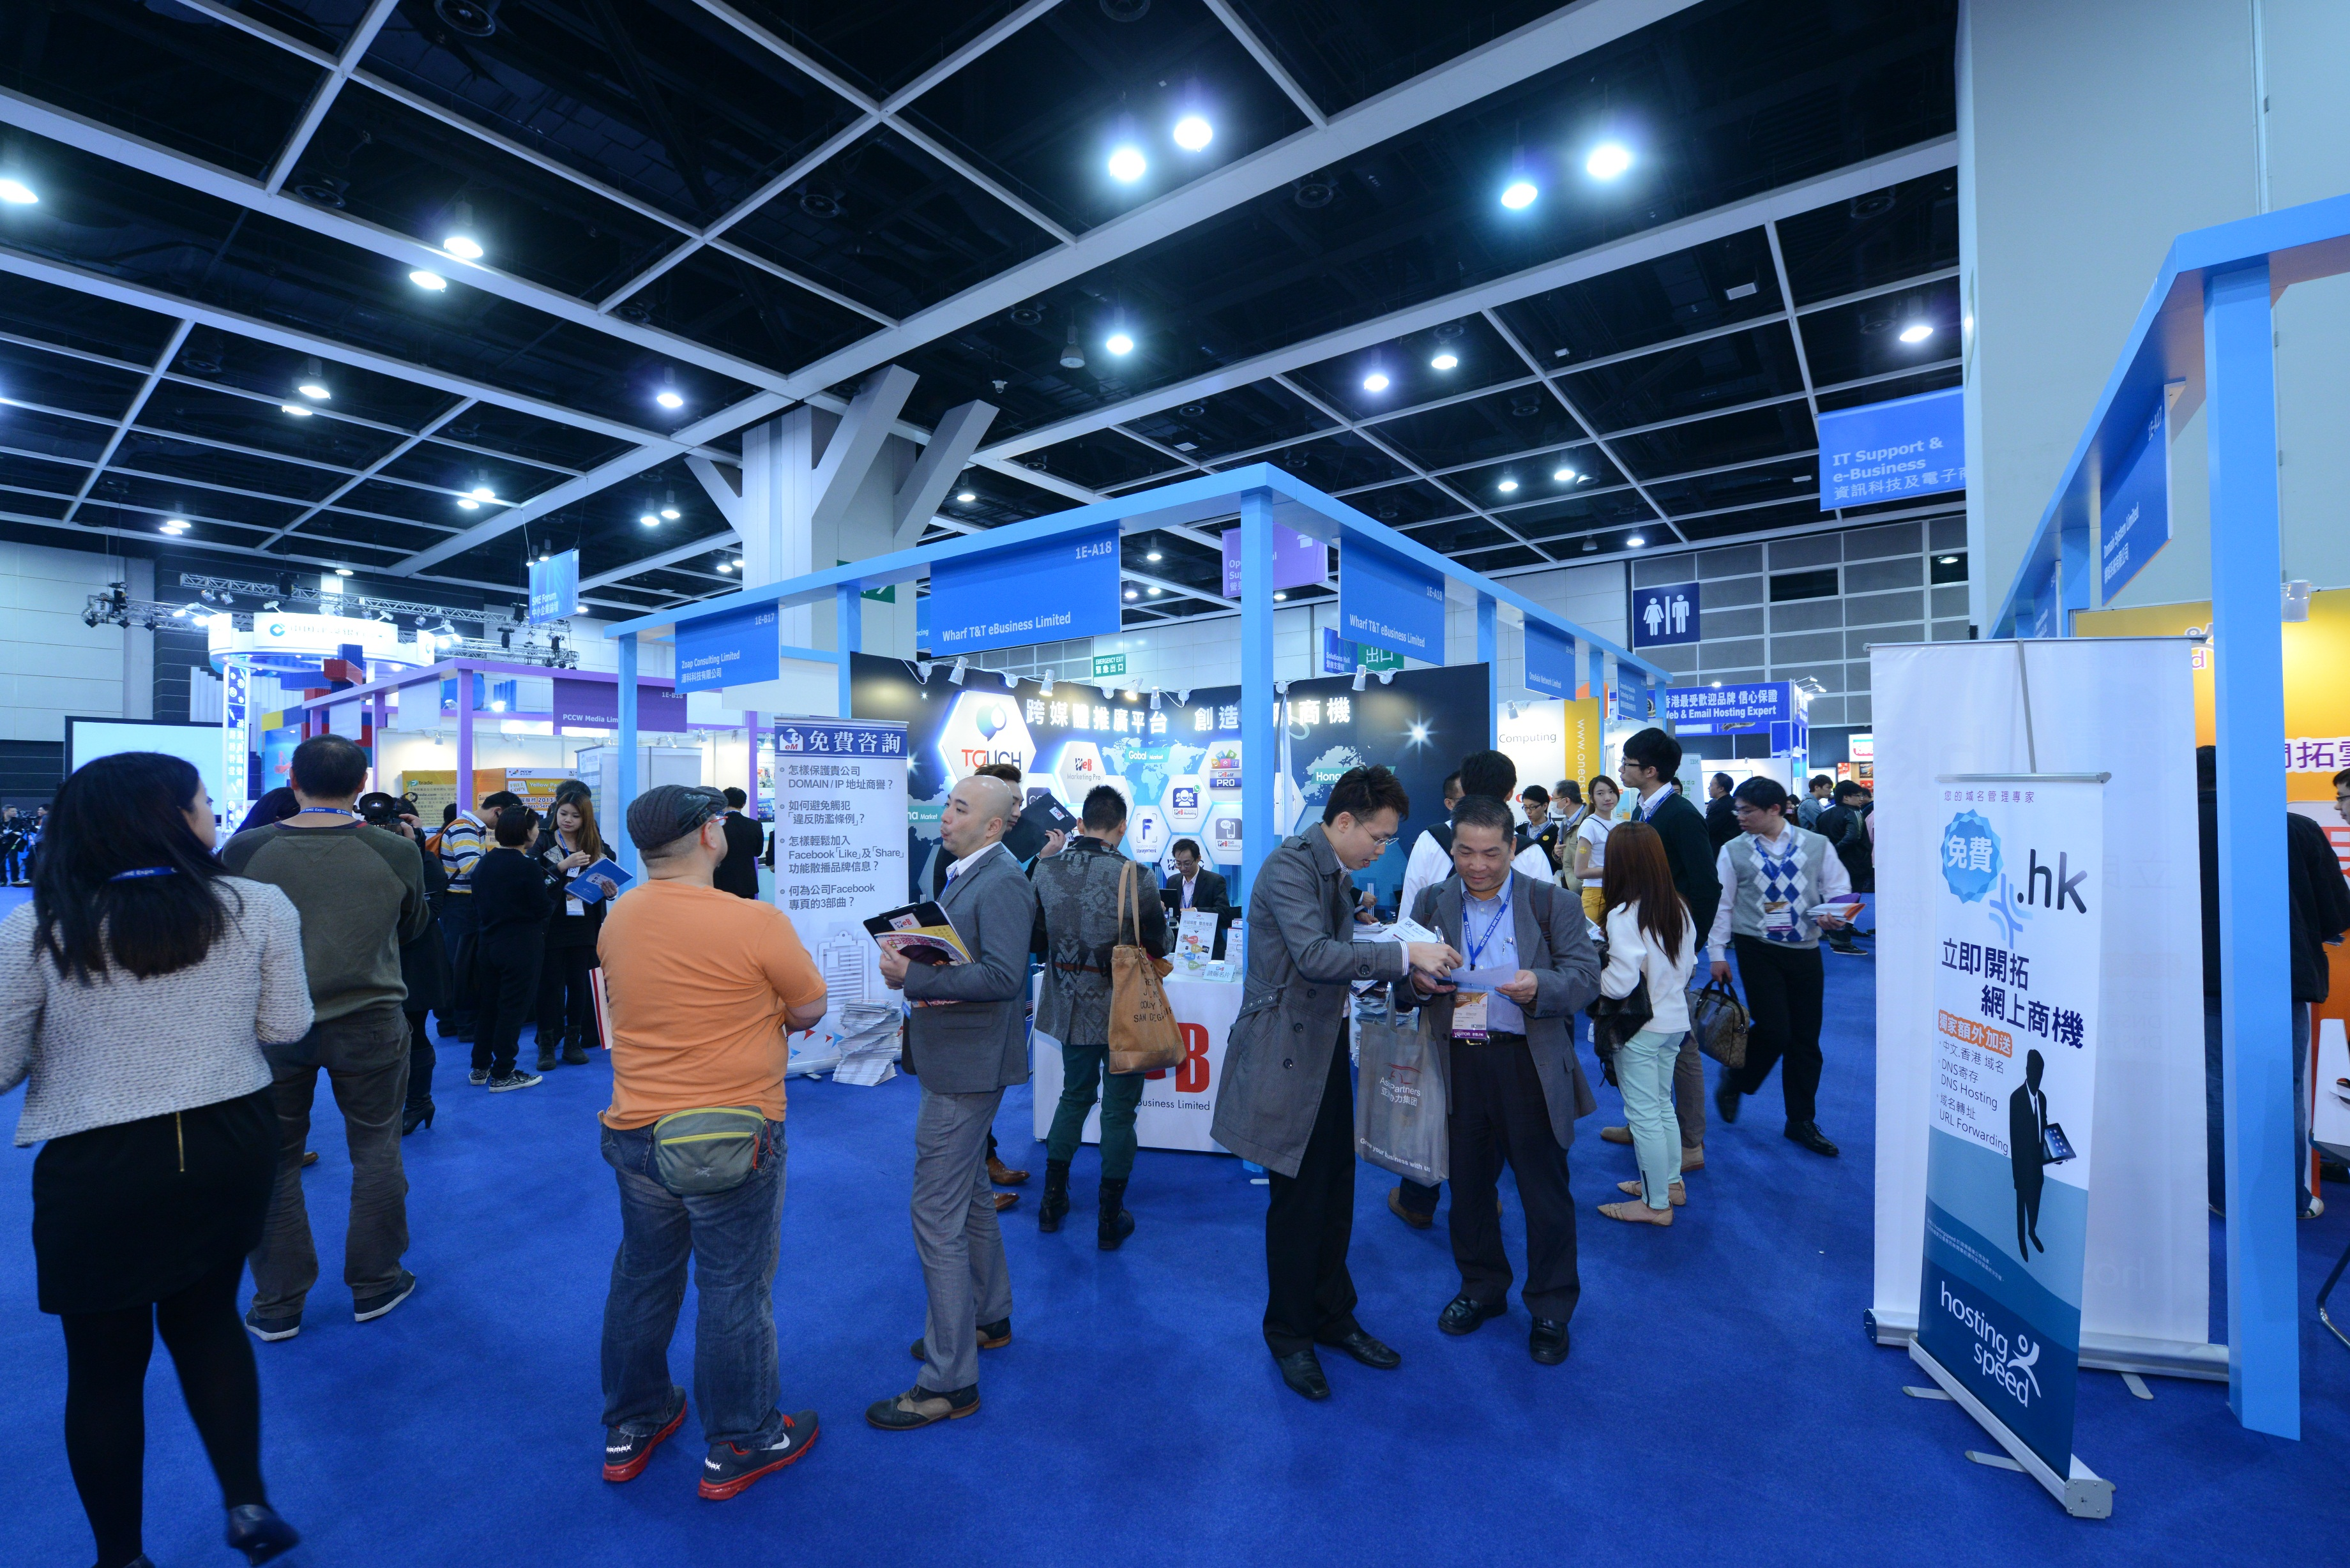 D Technology Exhibition : 兩大中小企博覽今天揭幕 香港貿發局新聞中心